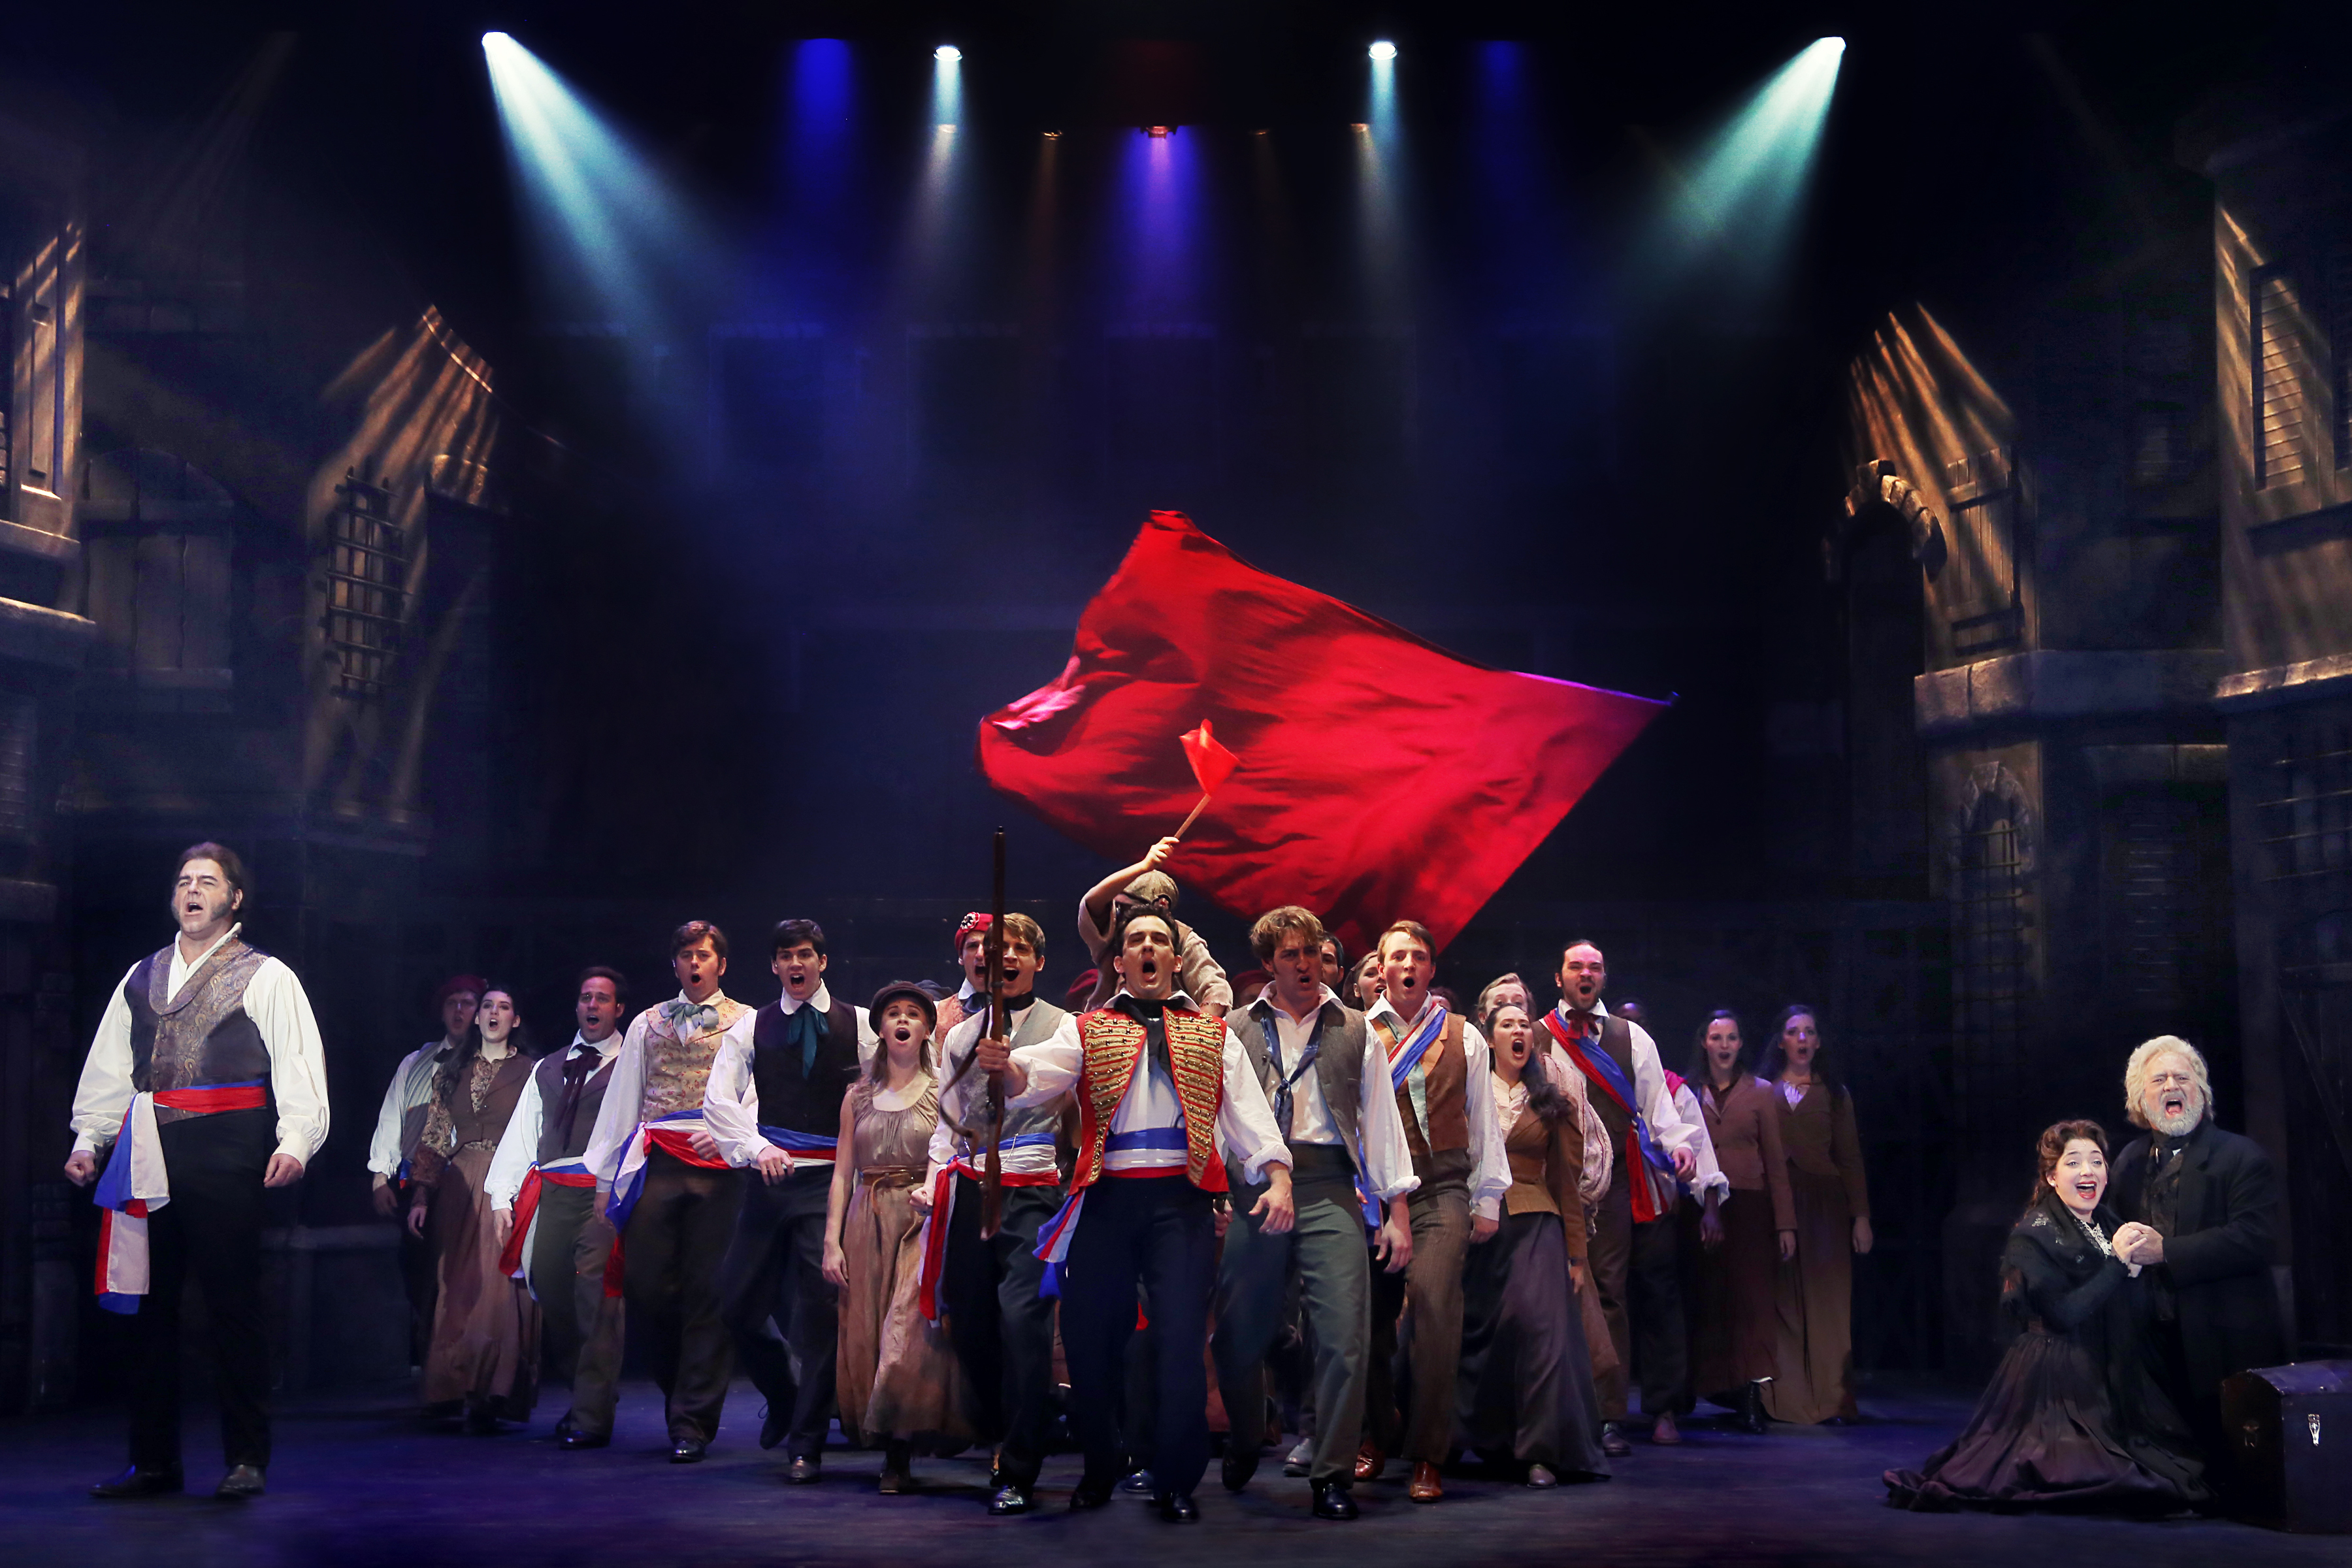 les miserables as a musical Watch full movie les misérables online on aflamio - مشاهدة فيلم les misérables 2012 مترجم اون لاين افلام.